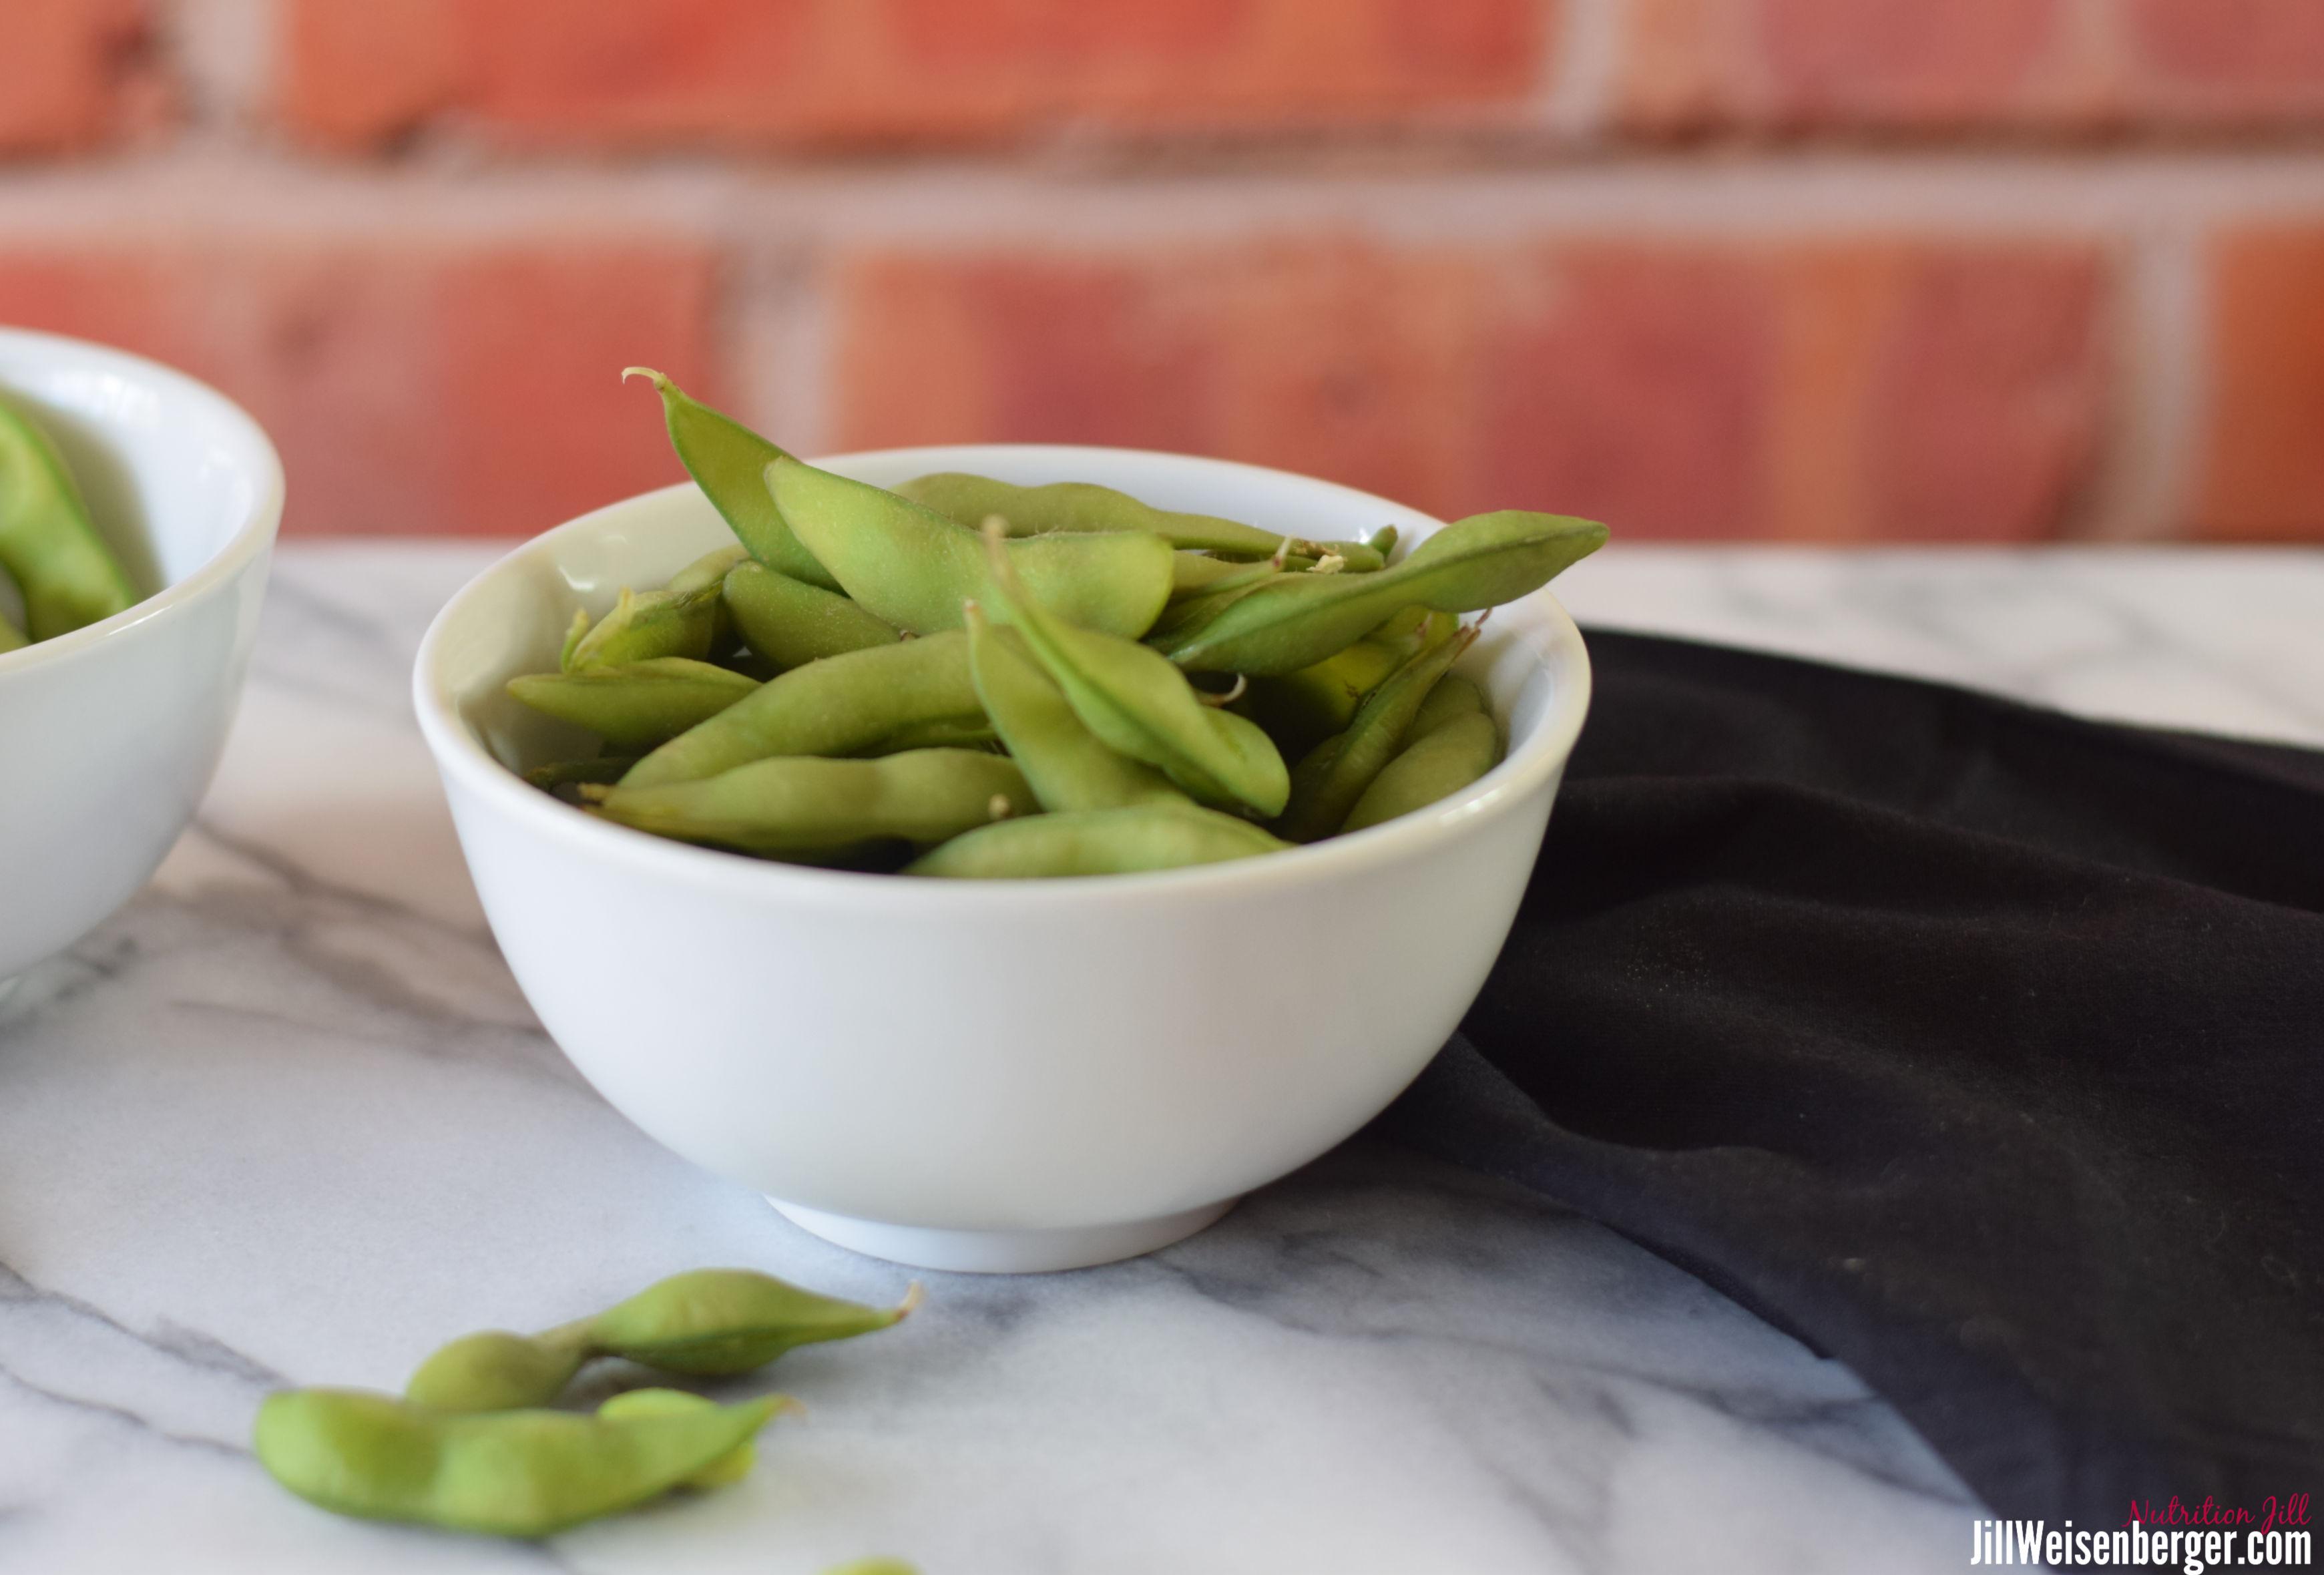 2 bowls of edamame beans